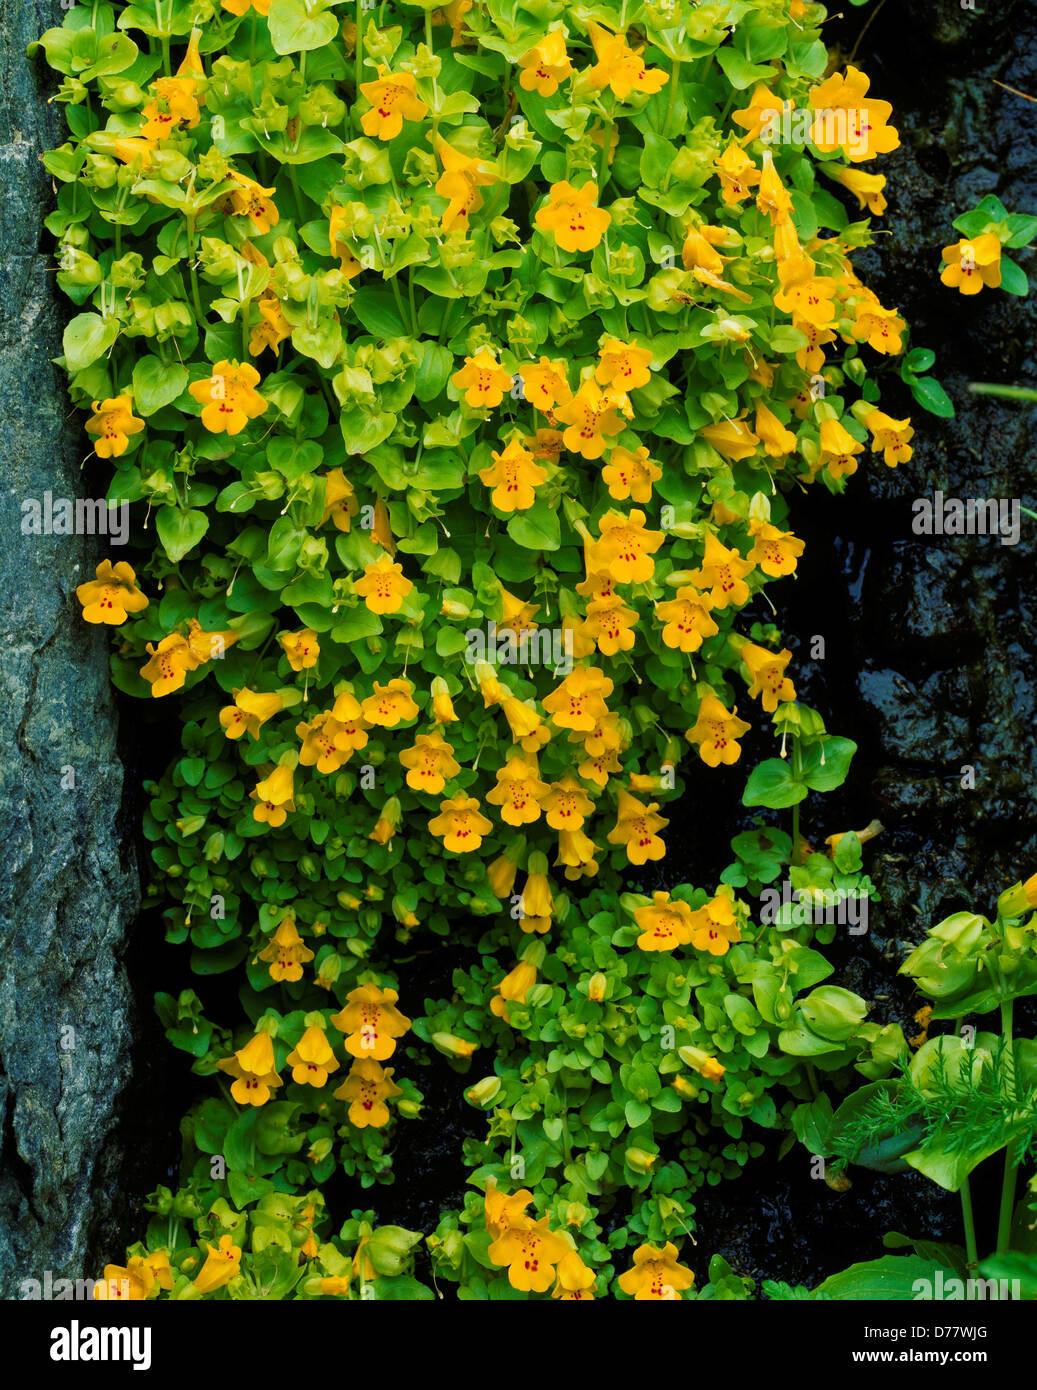 Seep Monkey Flower Stock Photos Seep Monkey Flower Stock Images